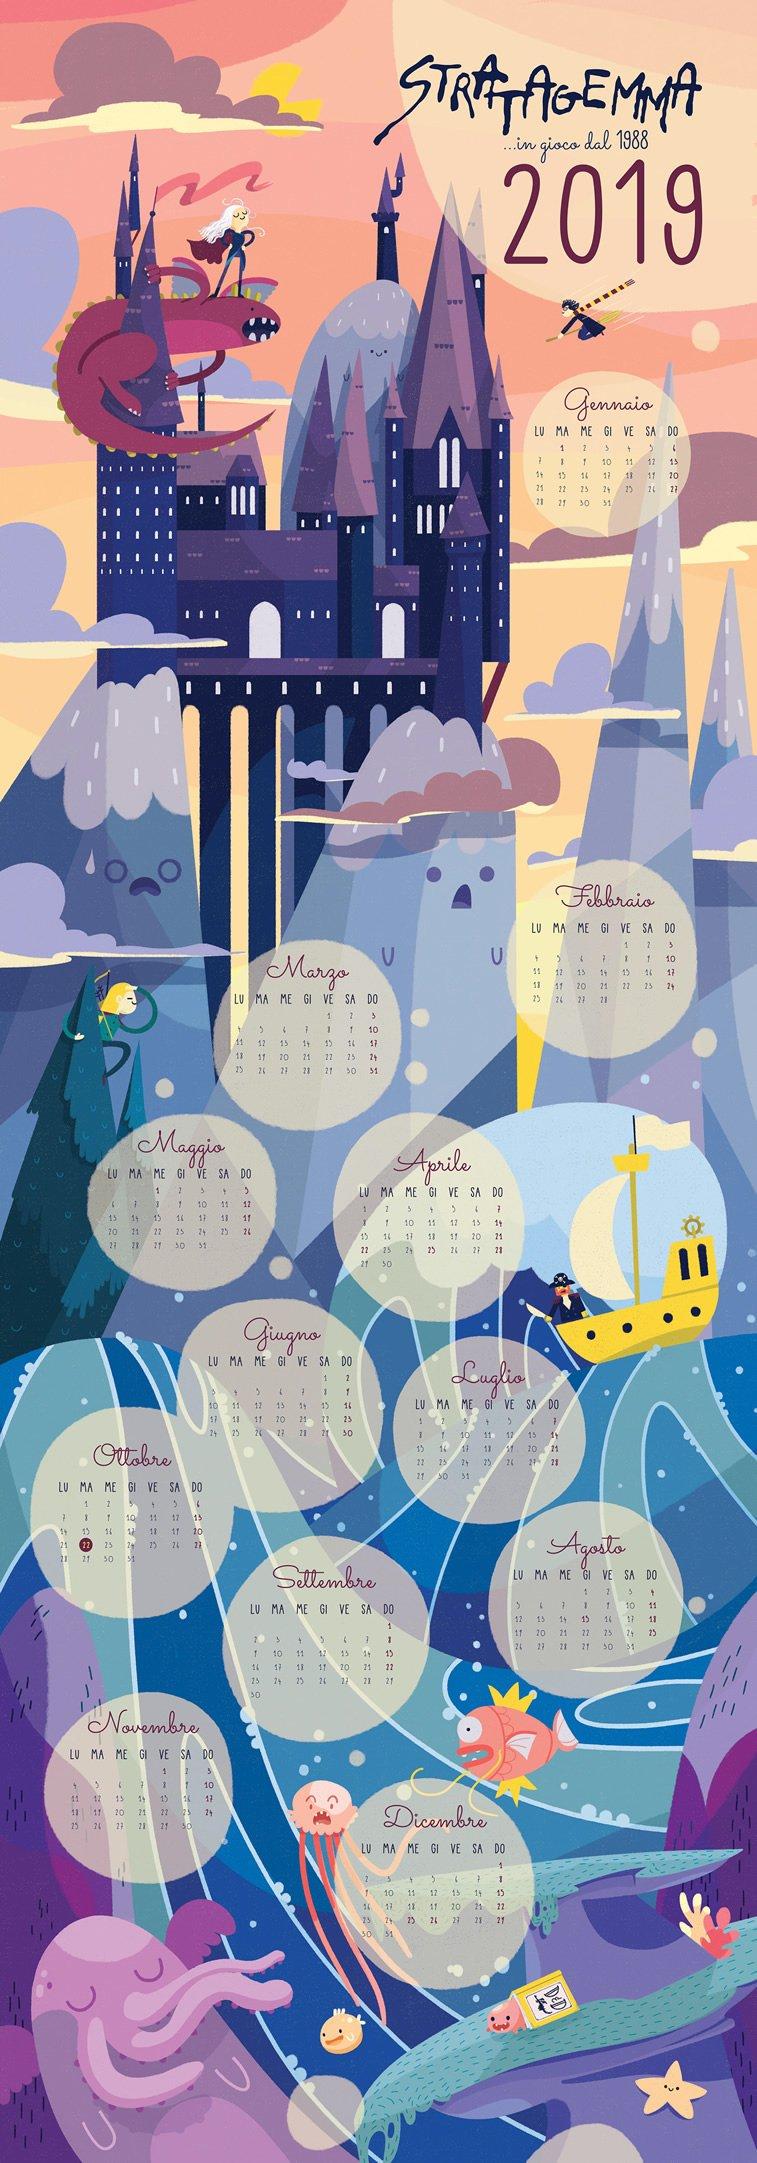 Stratagemma 2019 ilustrovani kalendar